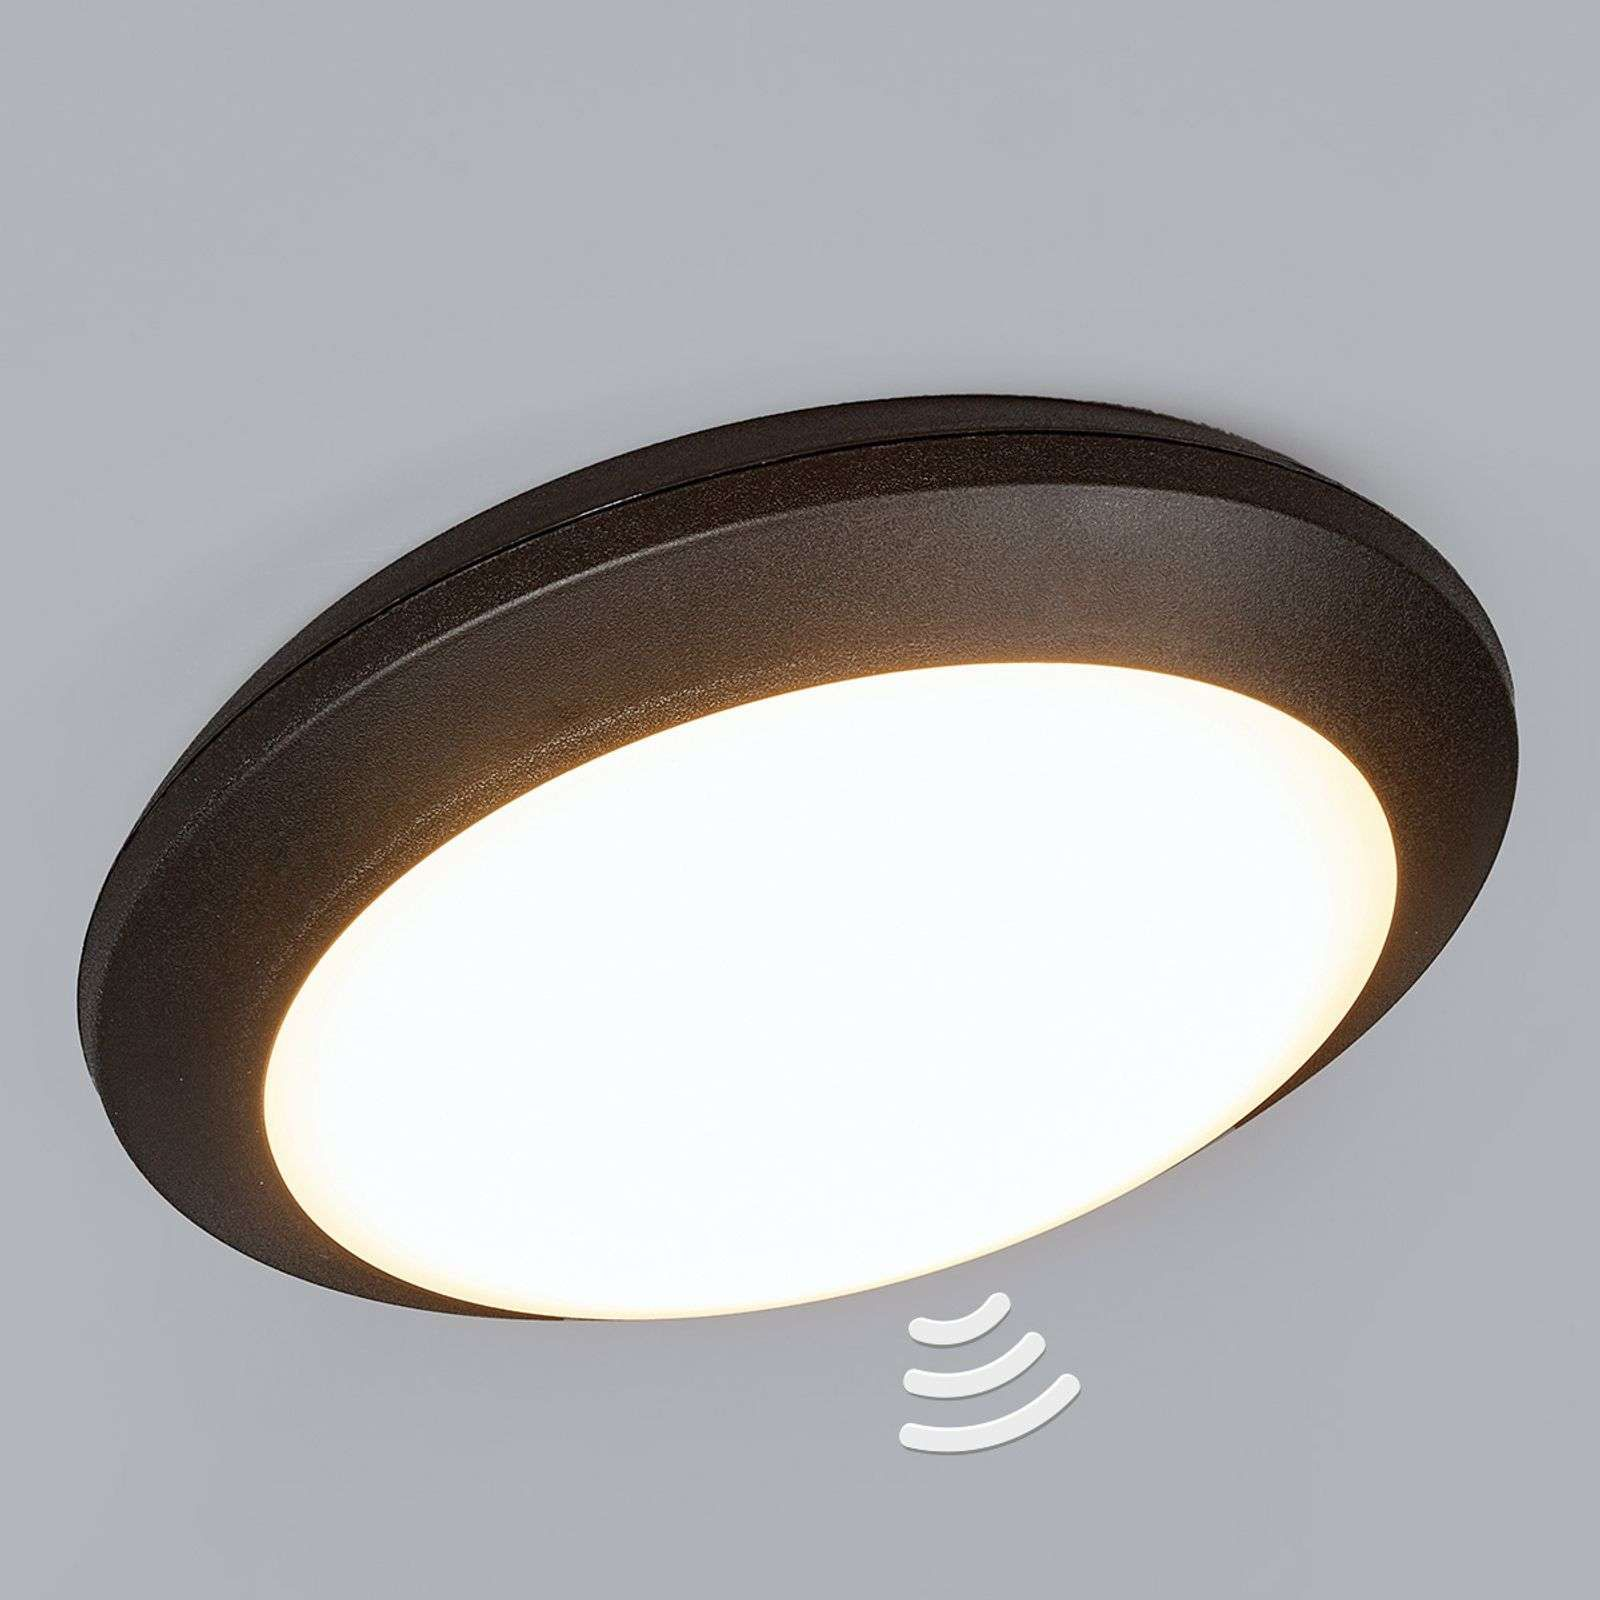 Plafondlamp Hout Wit Plafondlamp Philips Instyle Quine Moderne Plafondverlichting Slaapkamer Plafondlamp Ophangen Cent Plafondlamp Plafondverlichting Led